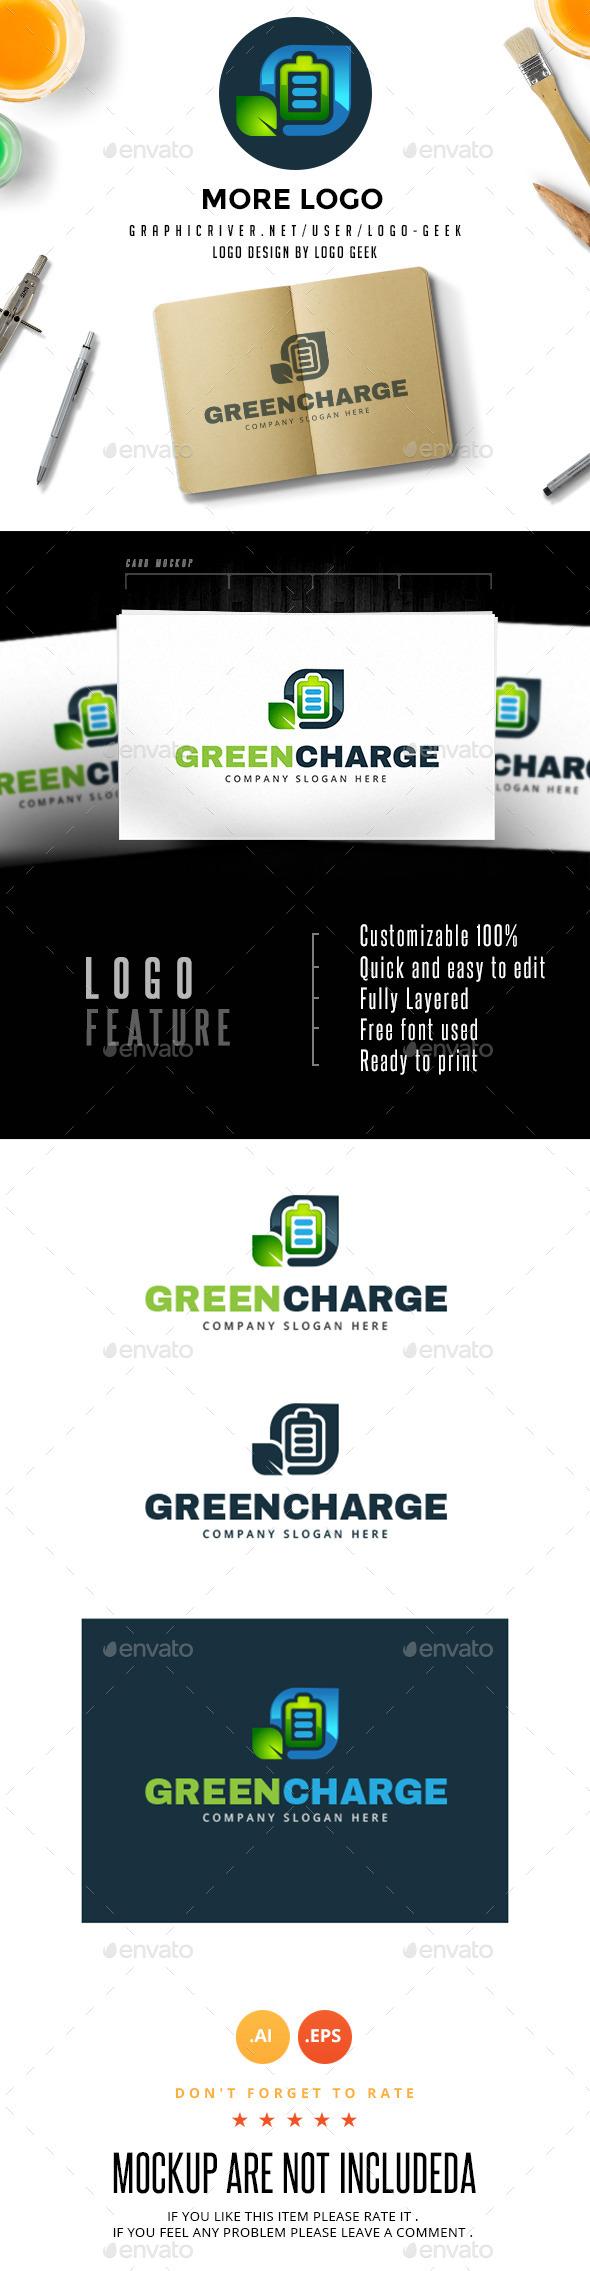 Green Charge Logo